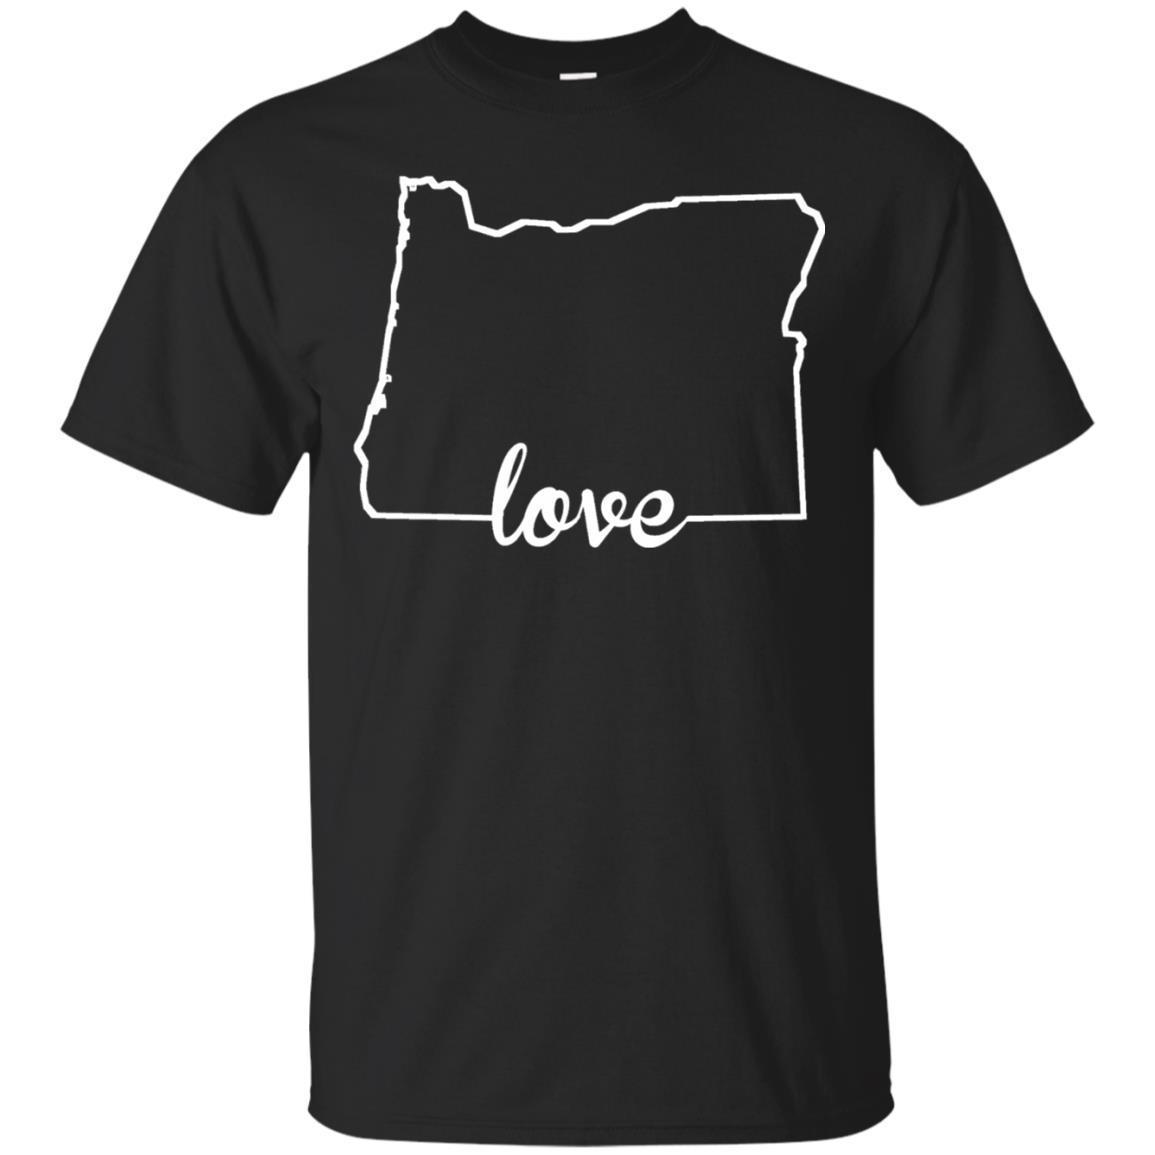 Oregon Love State Outline T-Shirt